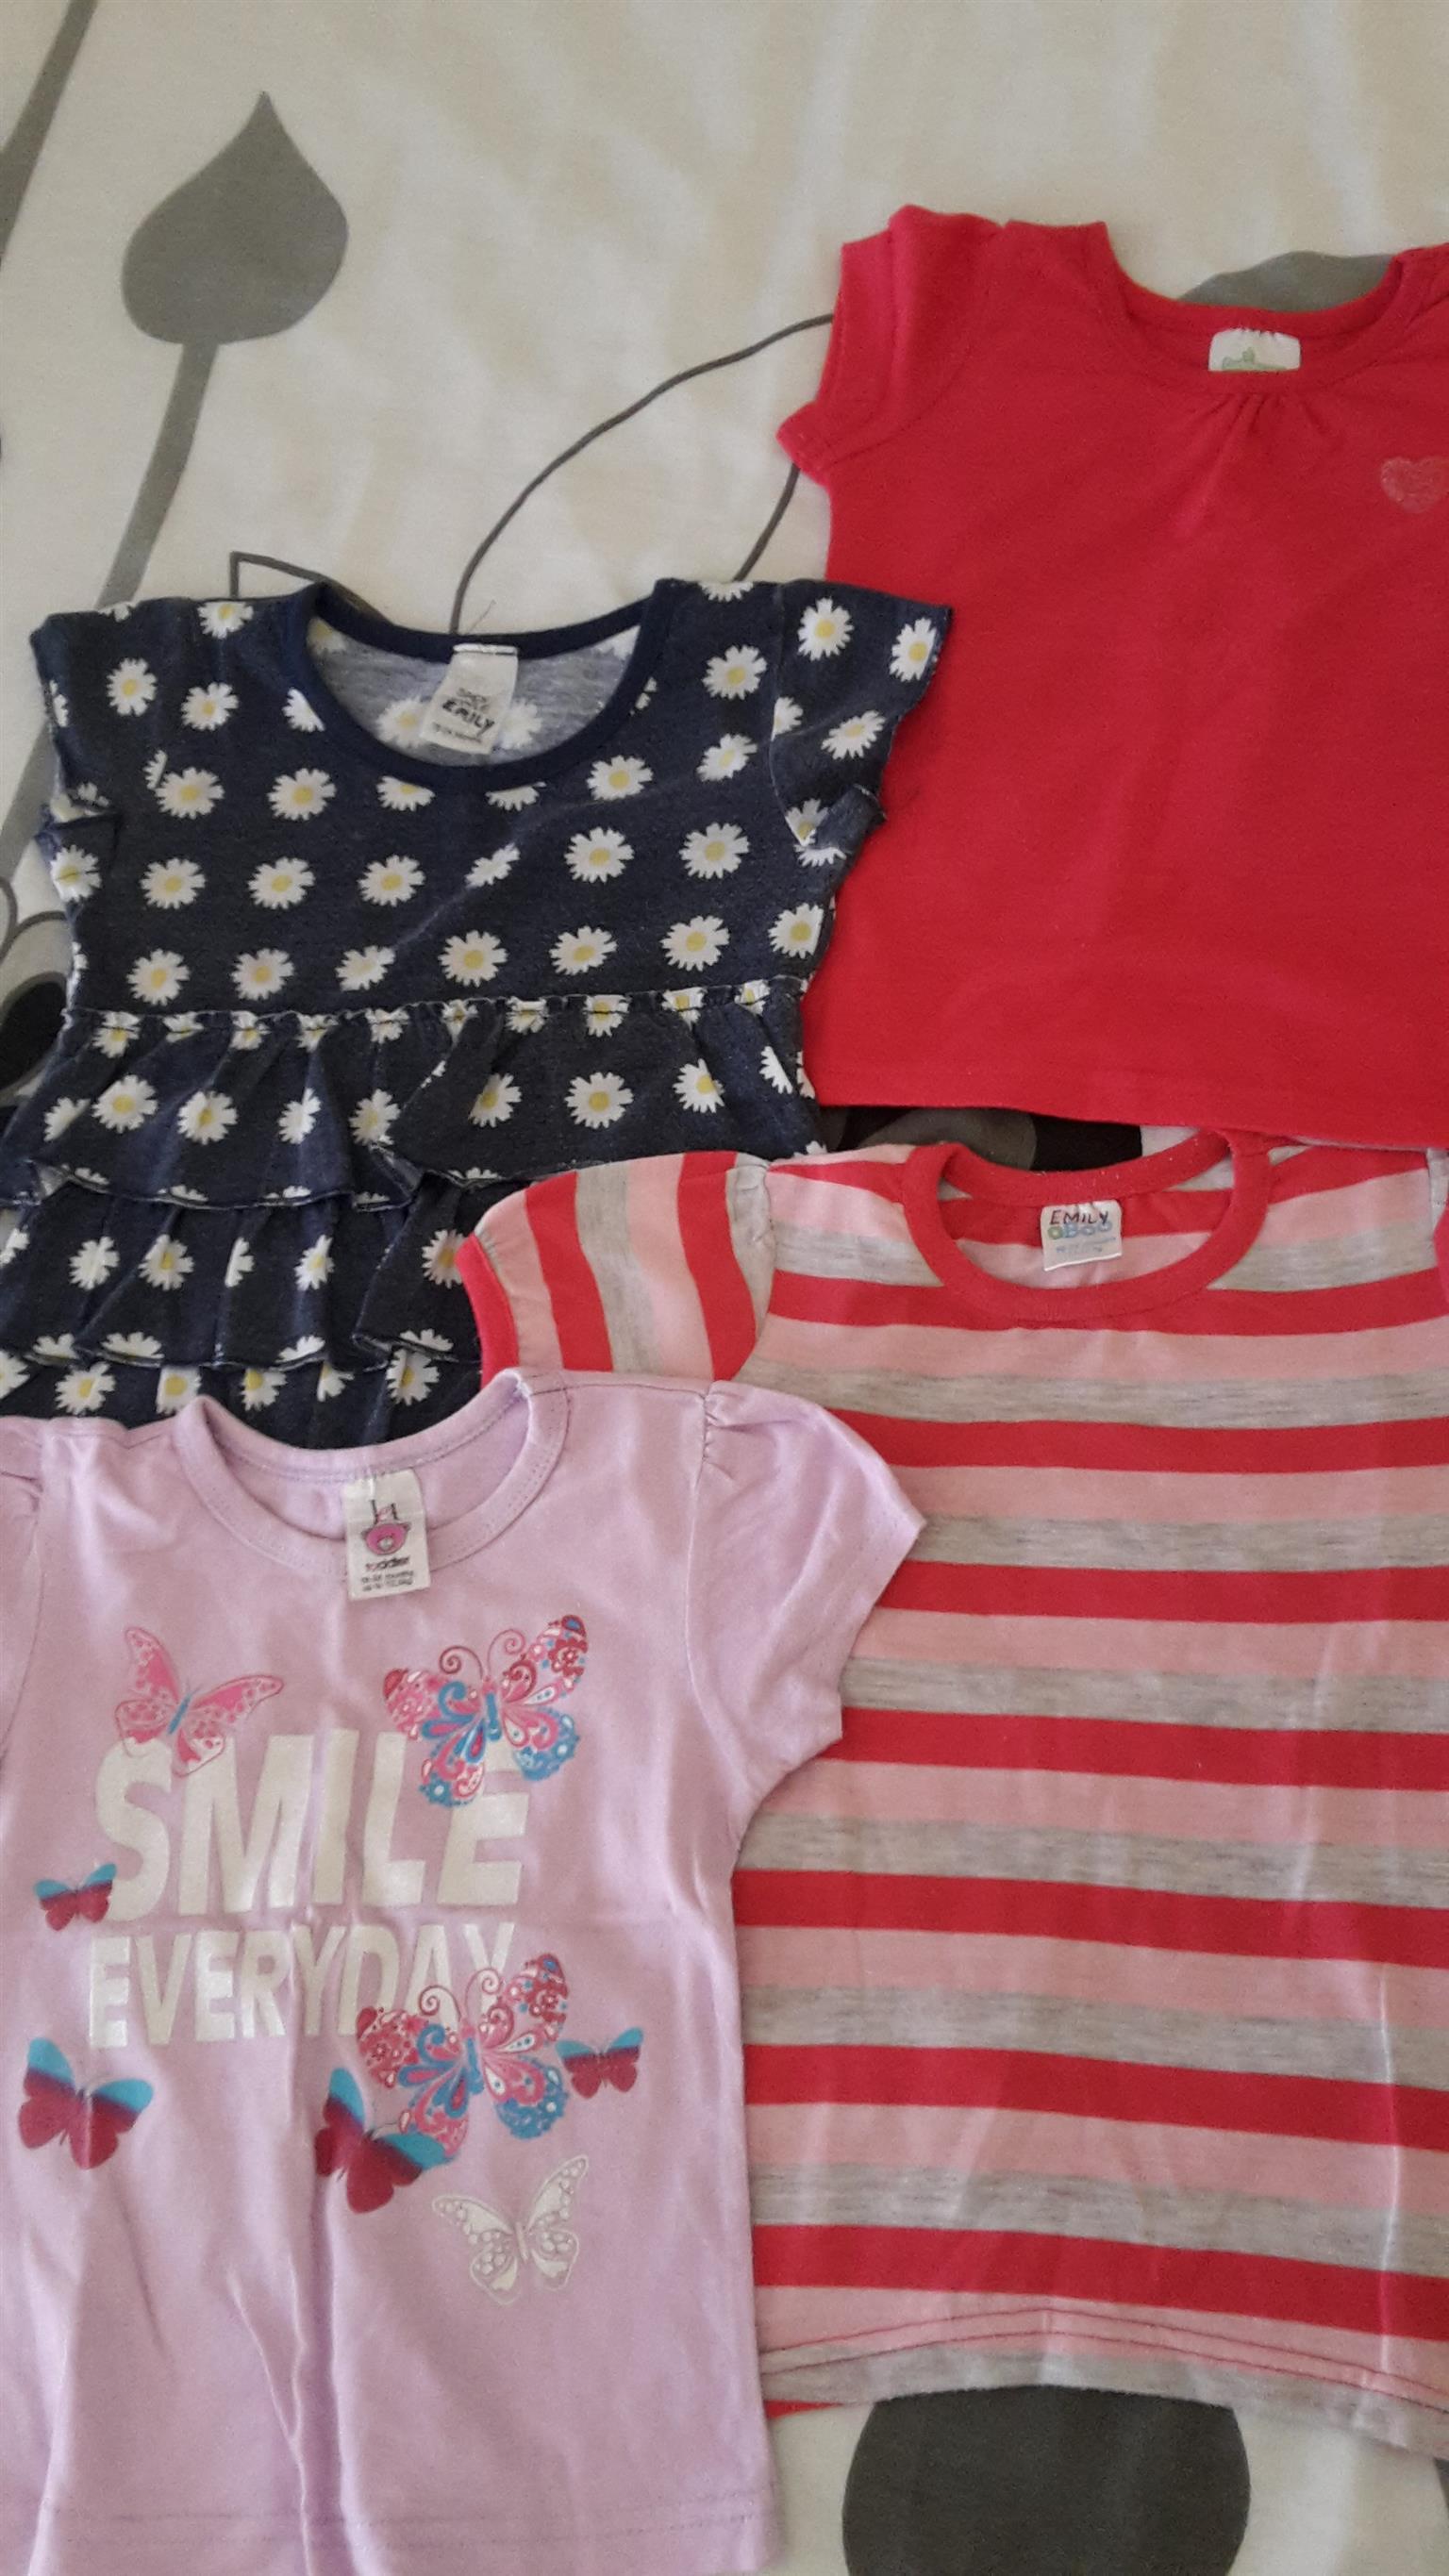 7c42d9836 Second hand baby clothes & shoes 12-24 months | Junk Mail